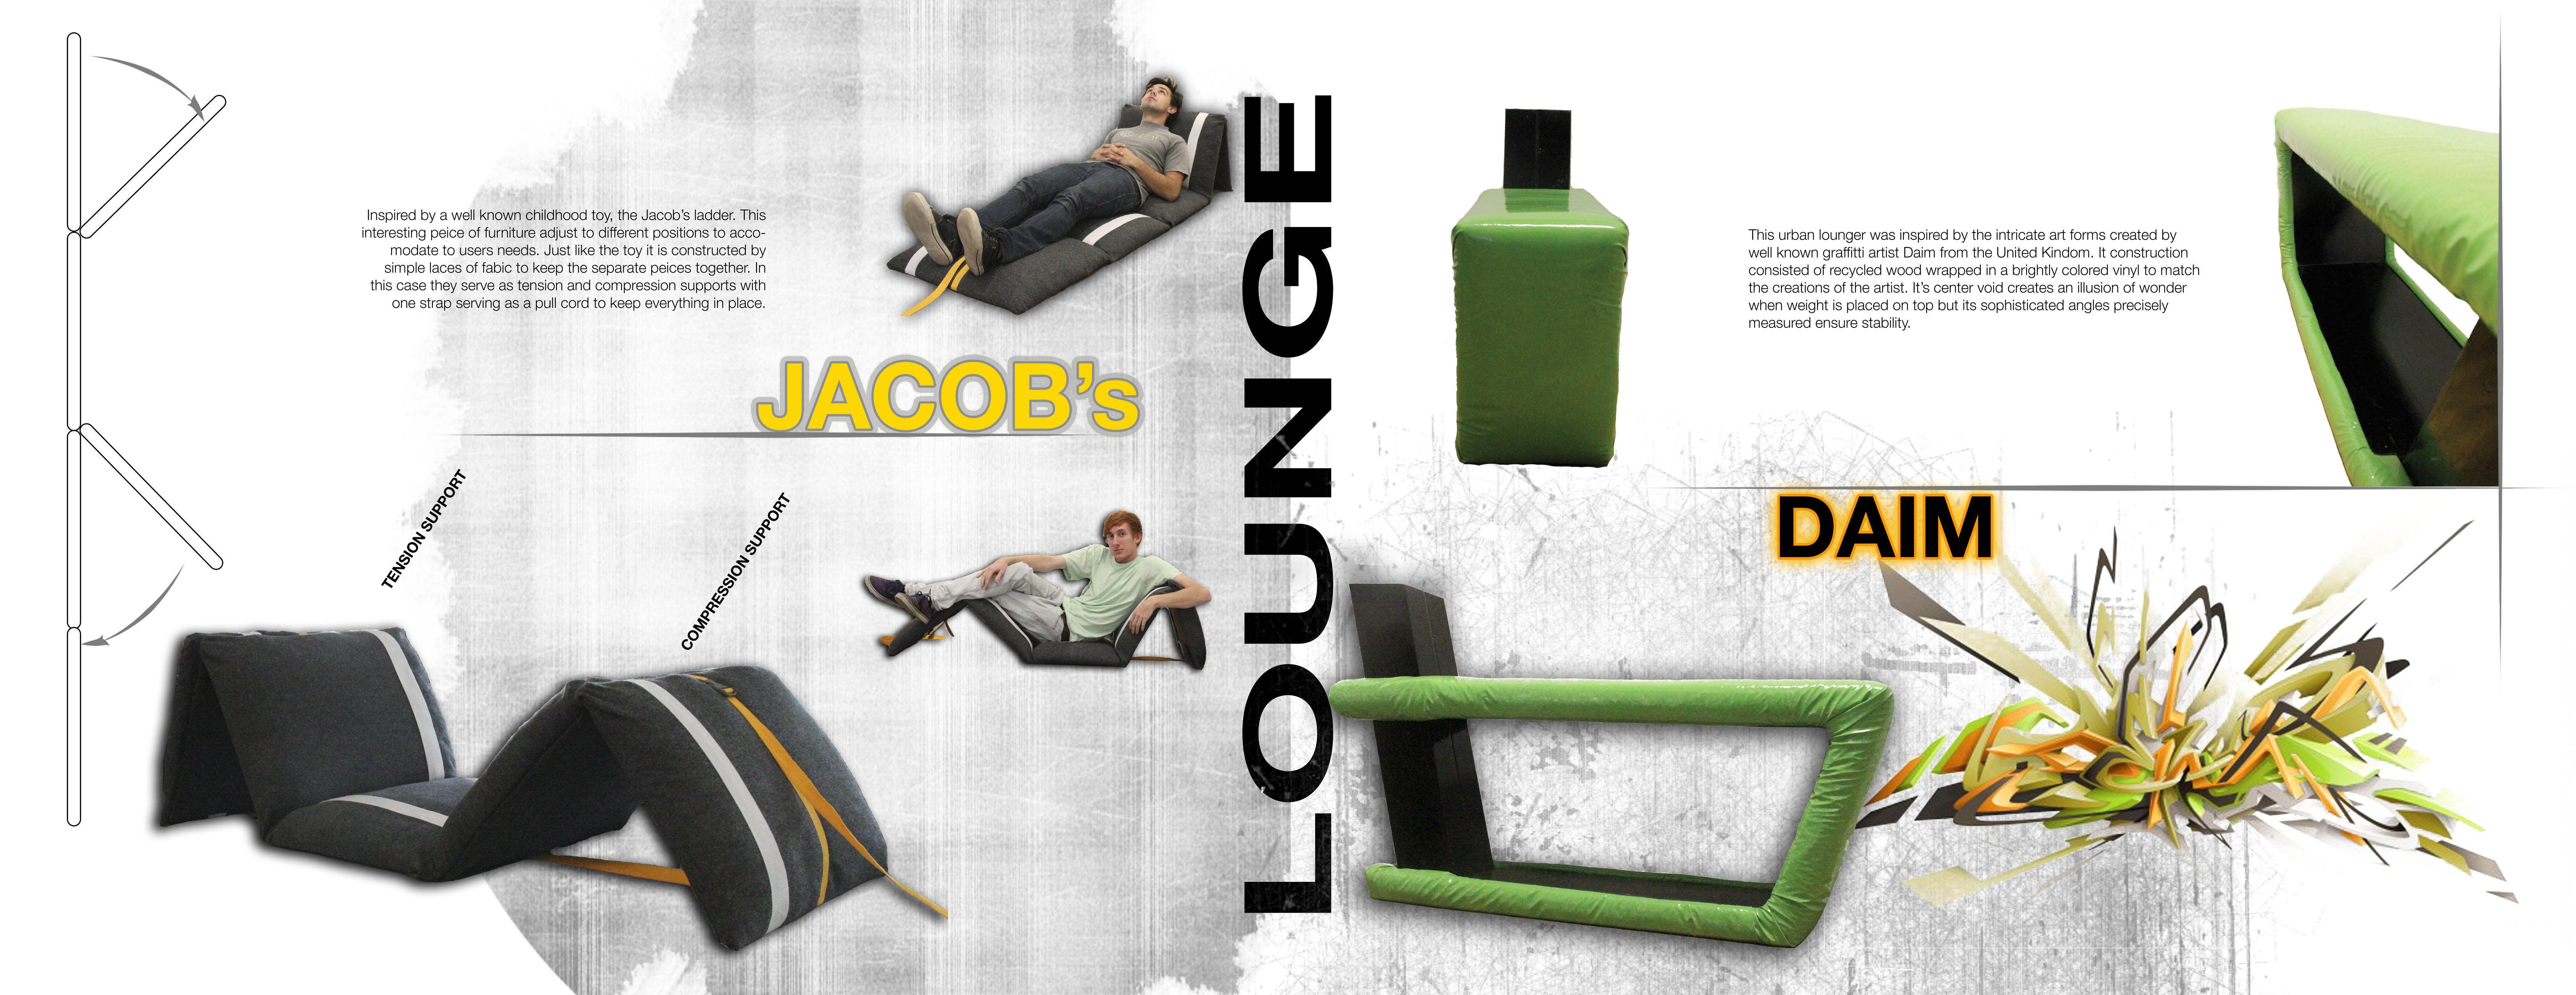 chair design portfolio adirondack wooden david saucedo a page 2